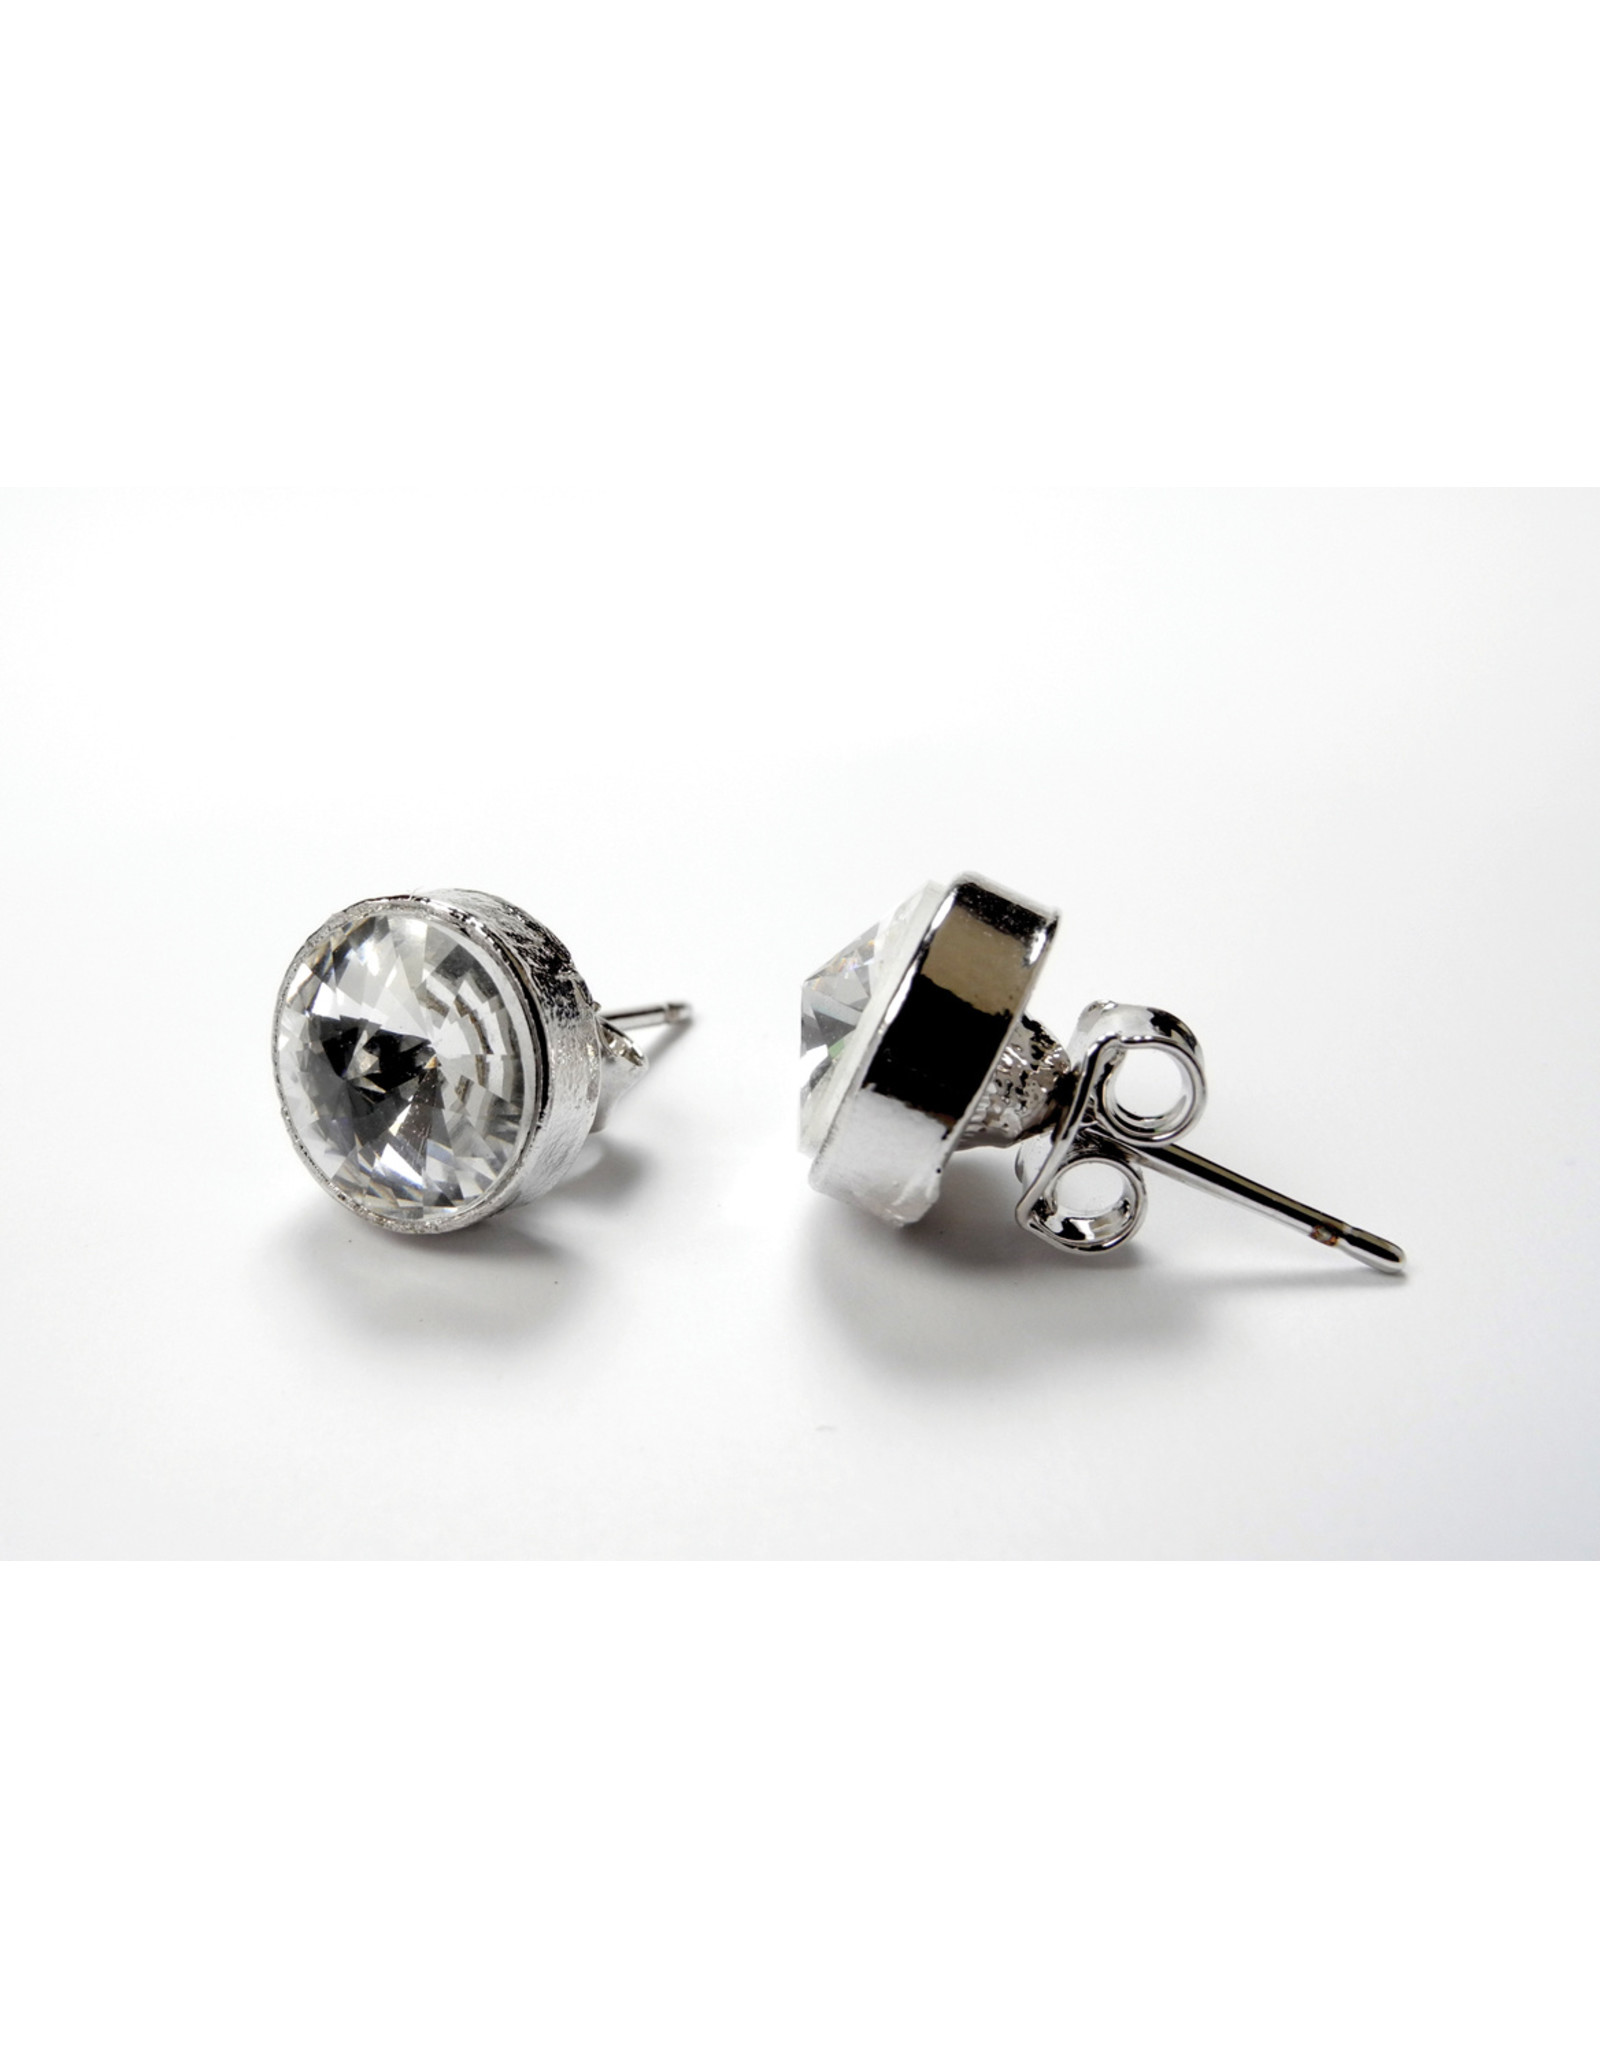 FH2 ROUND PIERCED DIAMOND EARRINGS